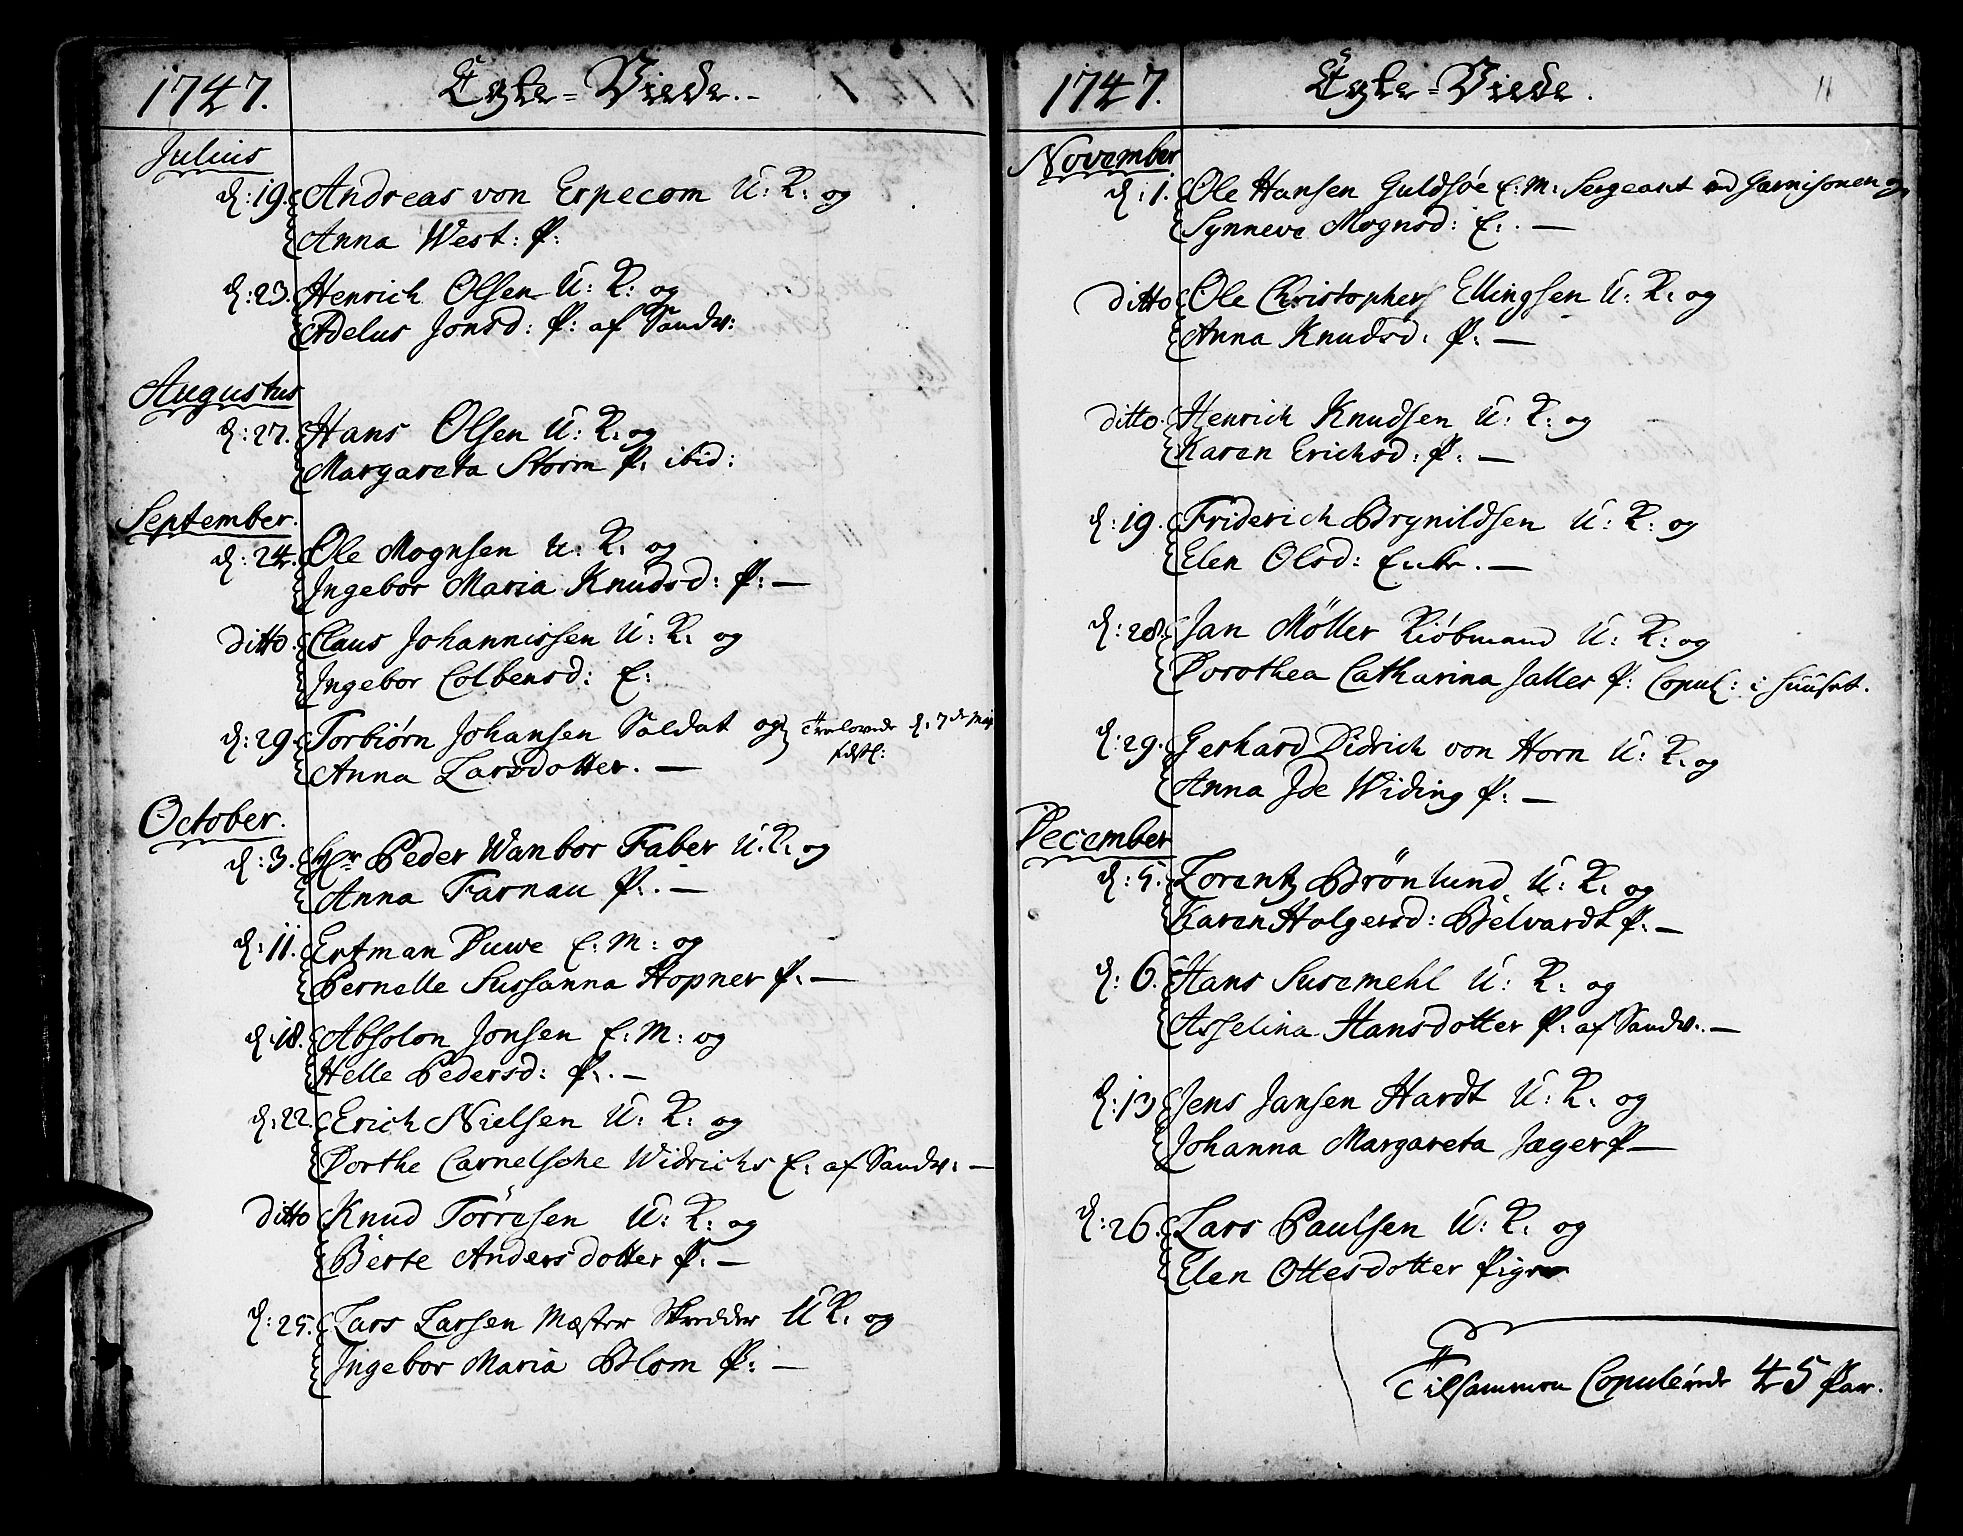 SAB, Korskirken Sokneprestembete, H/Haa/L0009: Ministerialbok nr. A 9, 1743-1861, s. 11